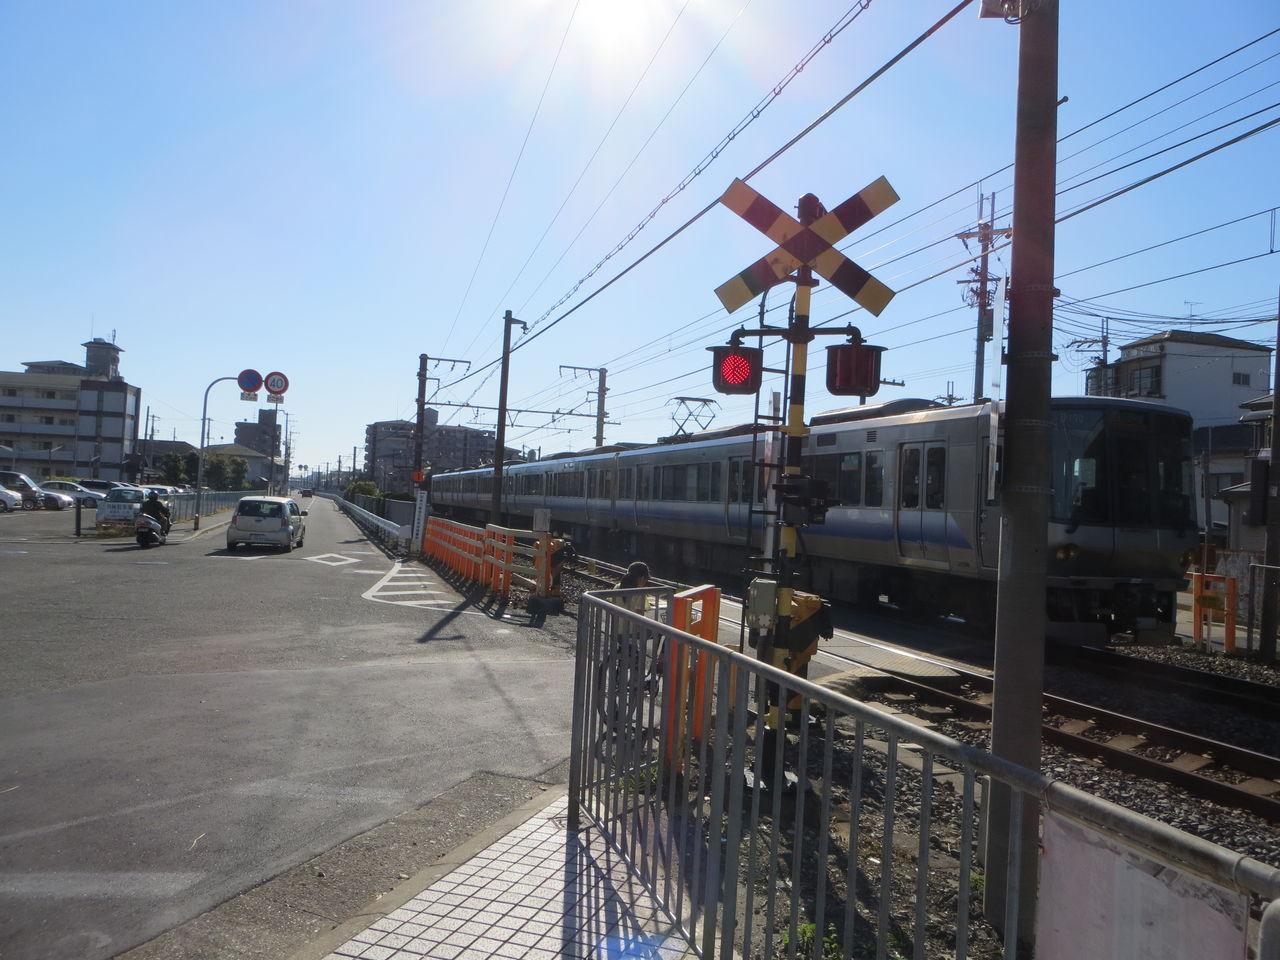 堺・泉北 風景写真 : 2015/10/18 和泉市・阪和線沿線めぐり